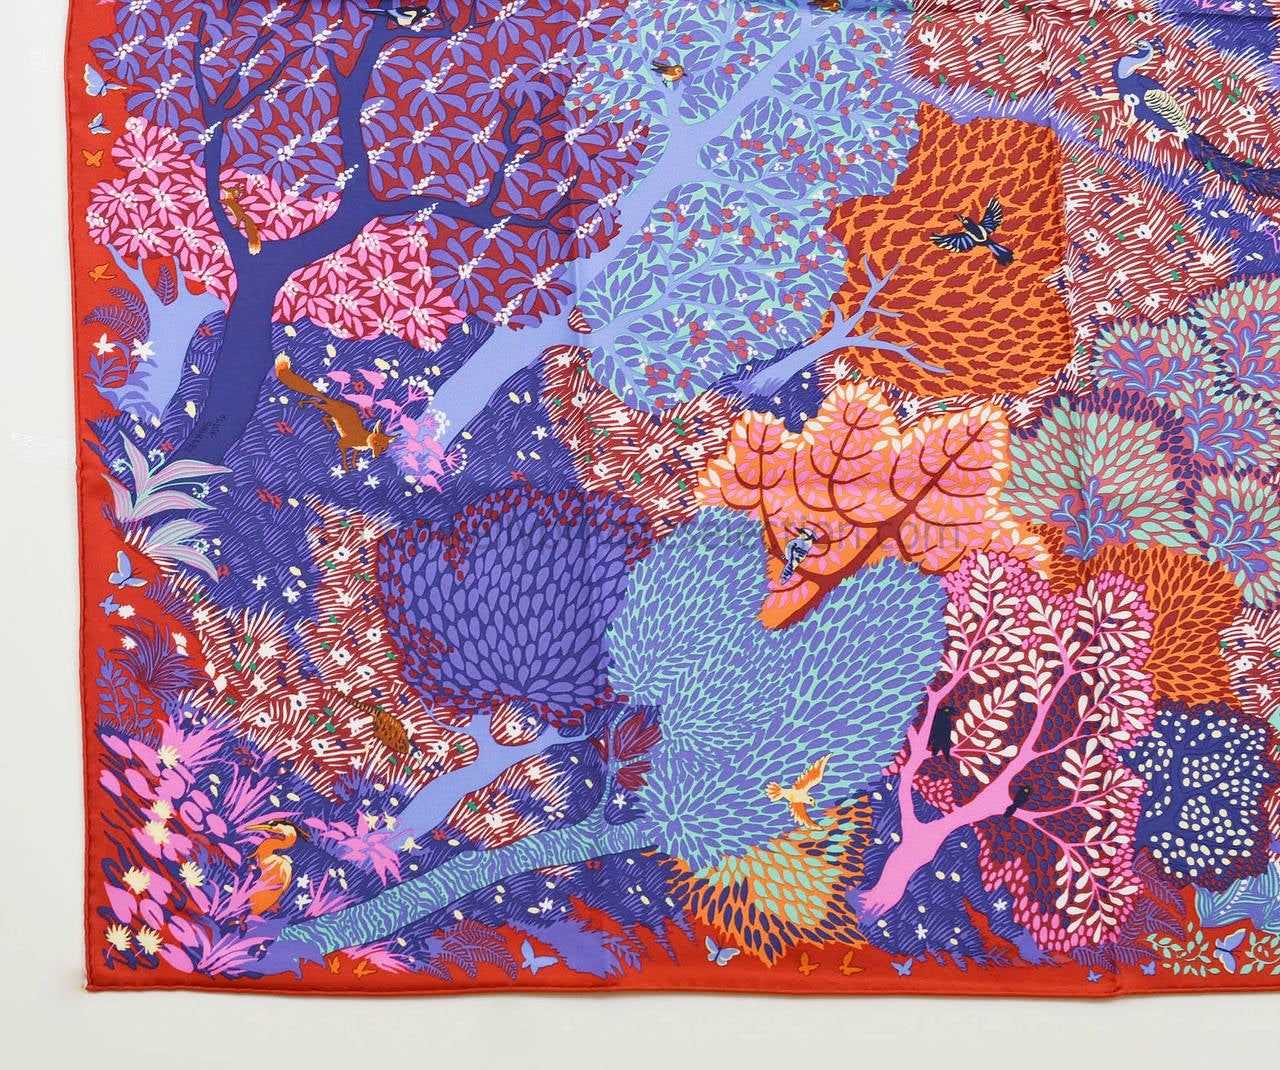 Hermes carre twill silk dans un jardin anglais red purple for Dans un jardin anglais hermes